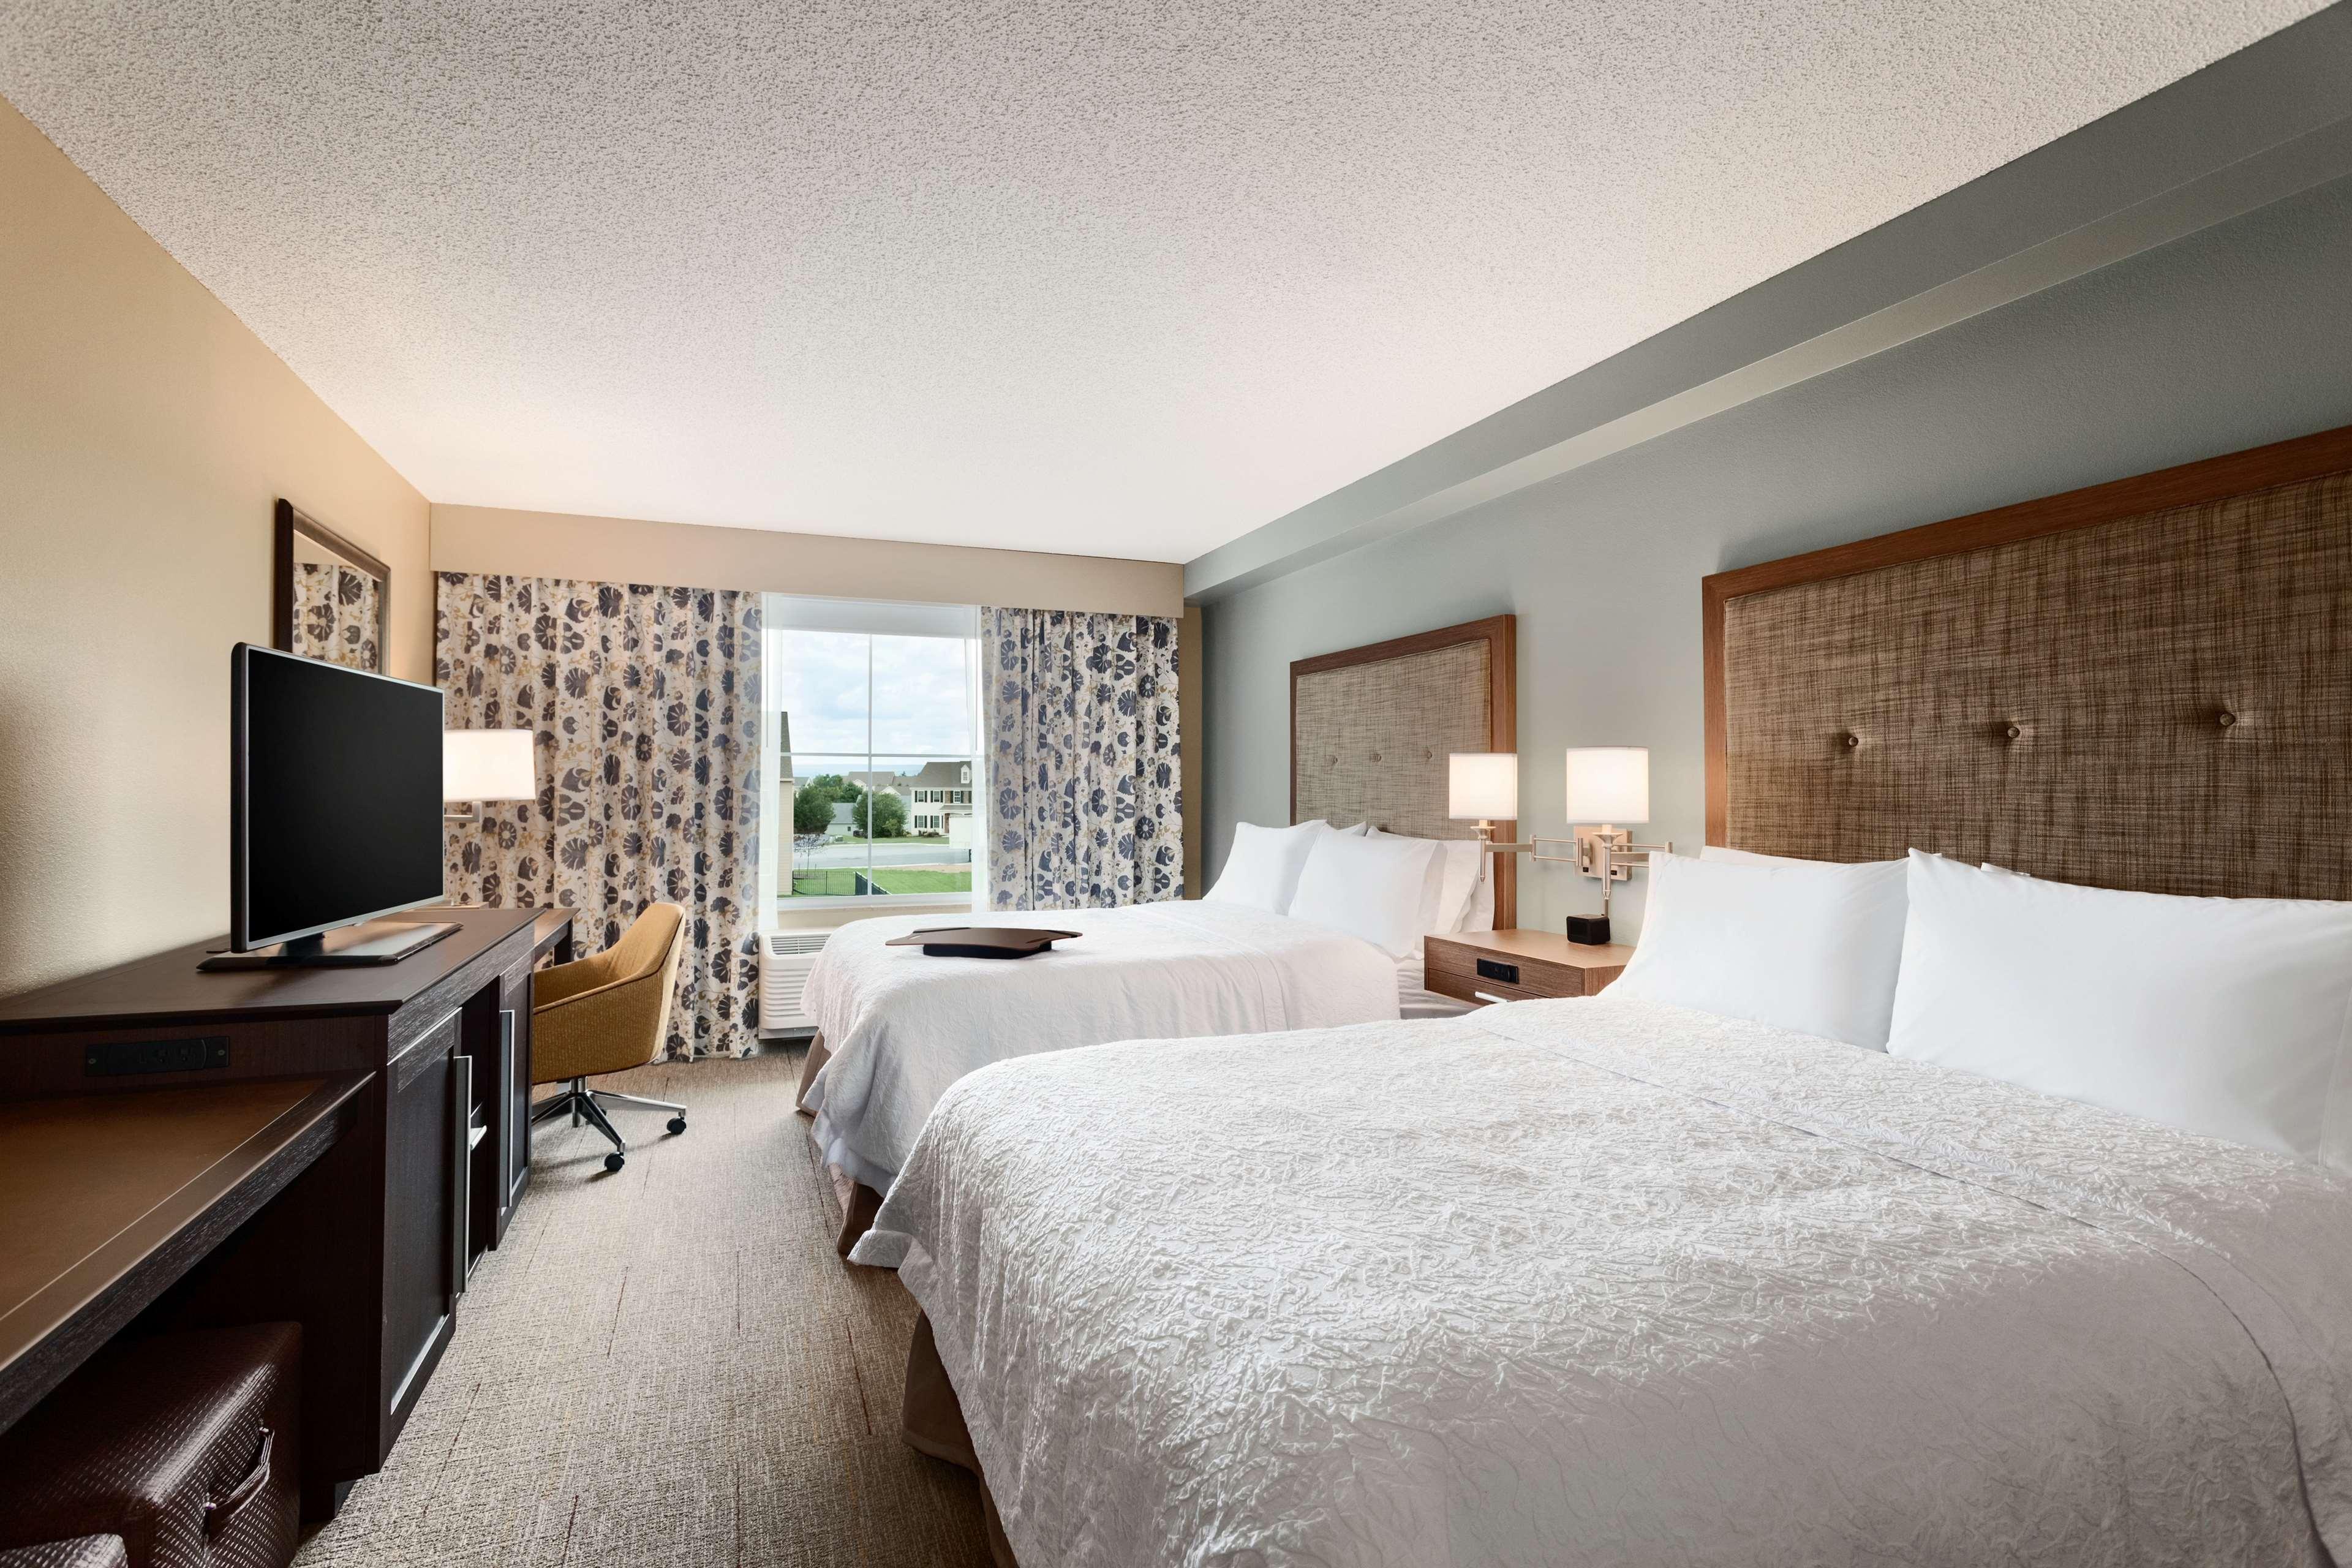 Hampton Inn & Suites Hershey Near The Park image 12